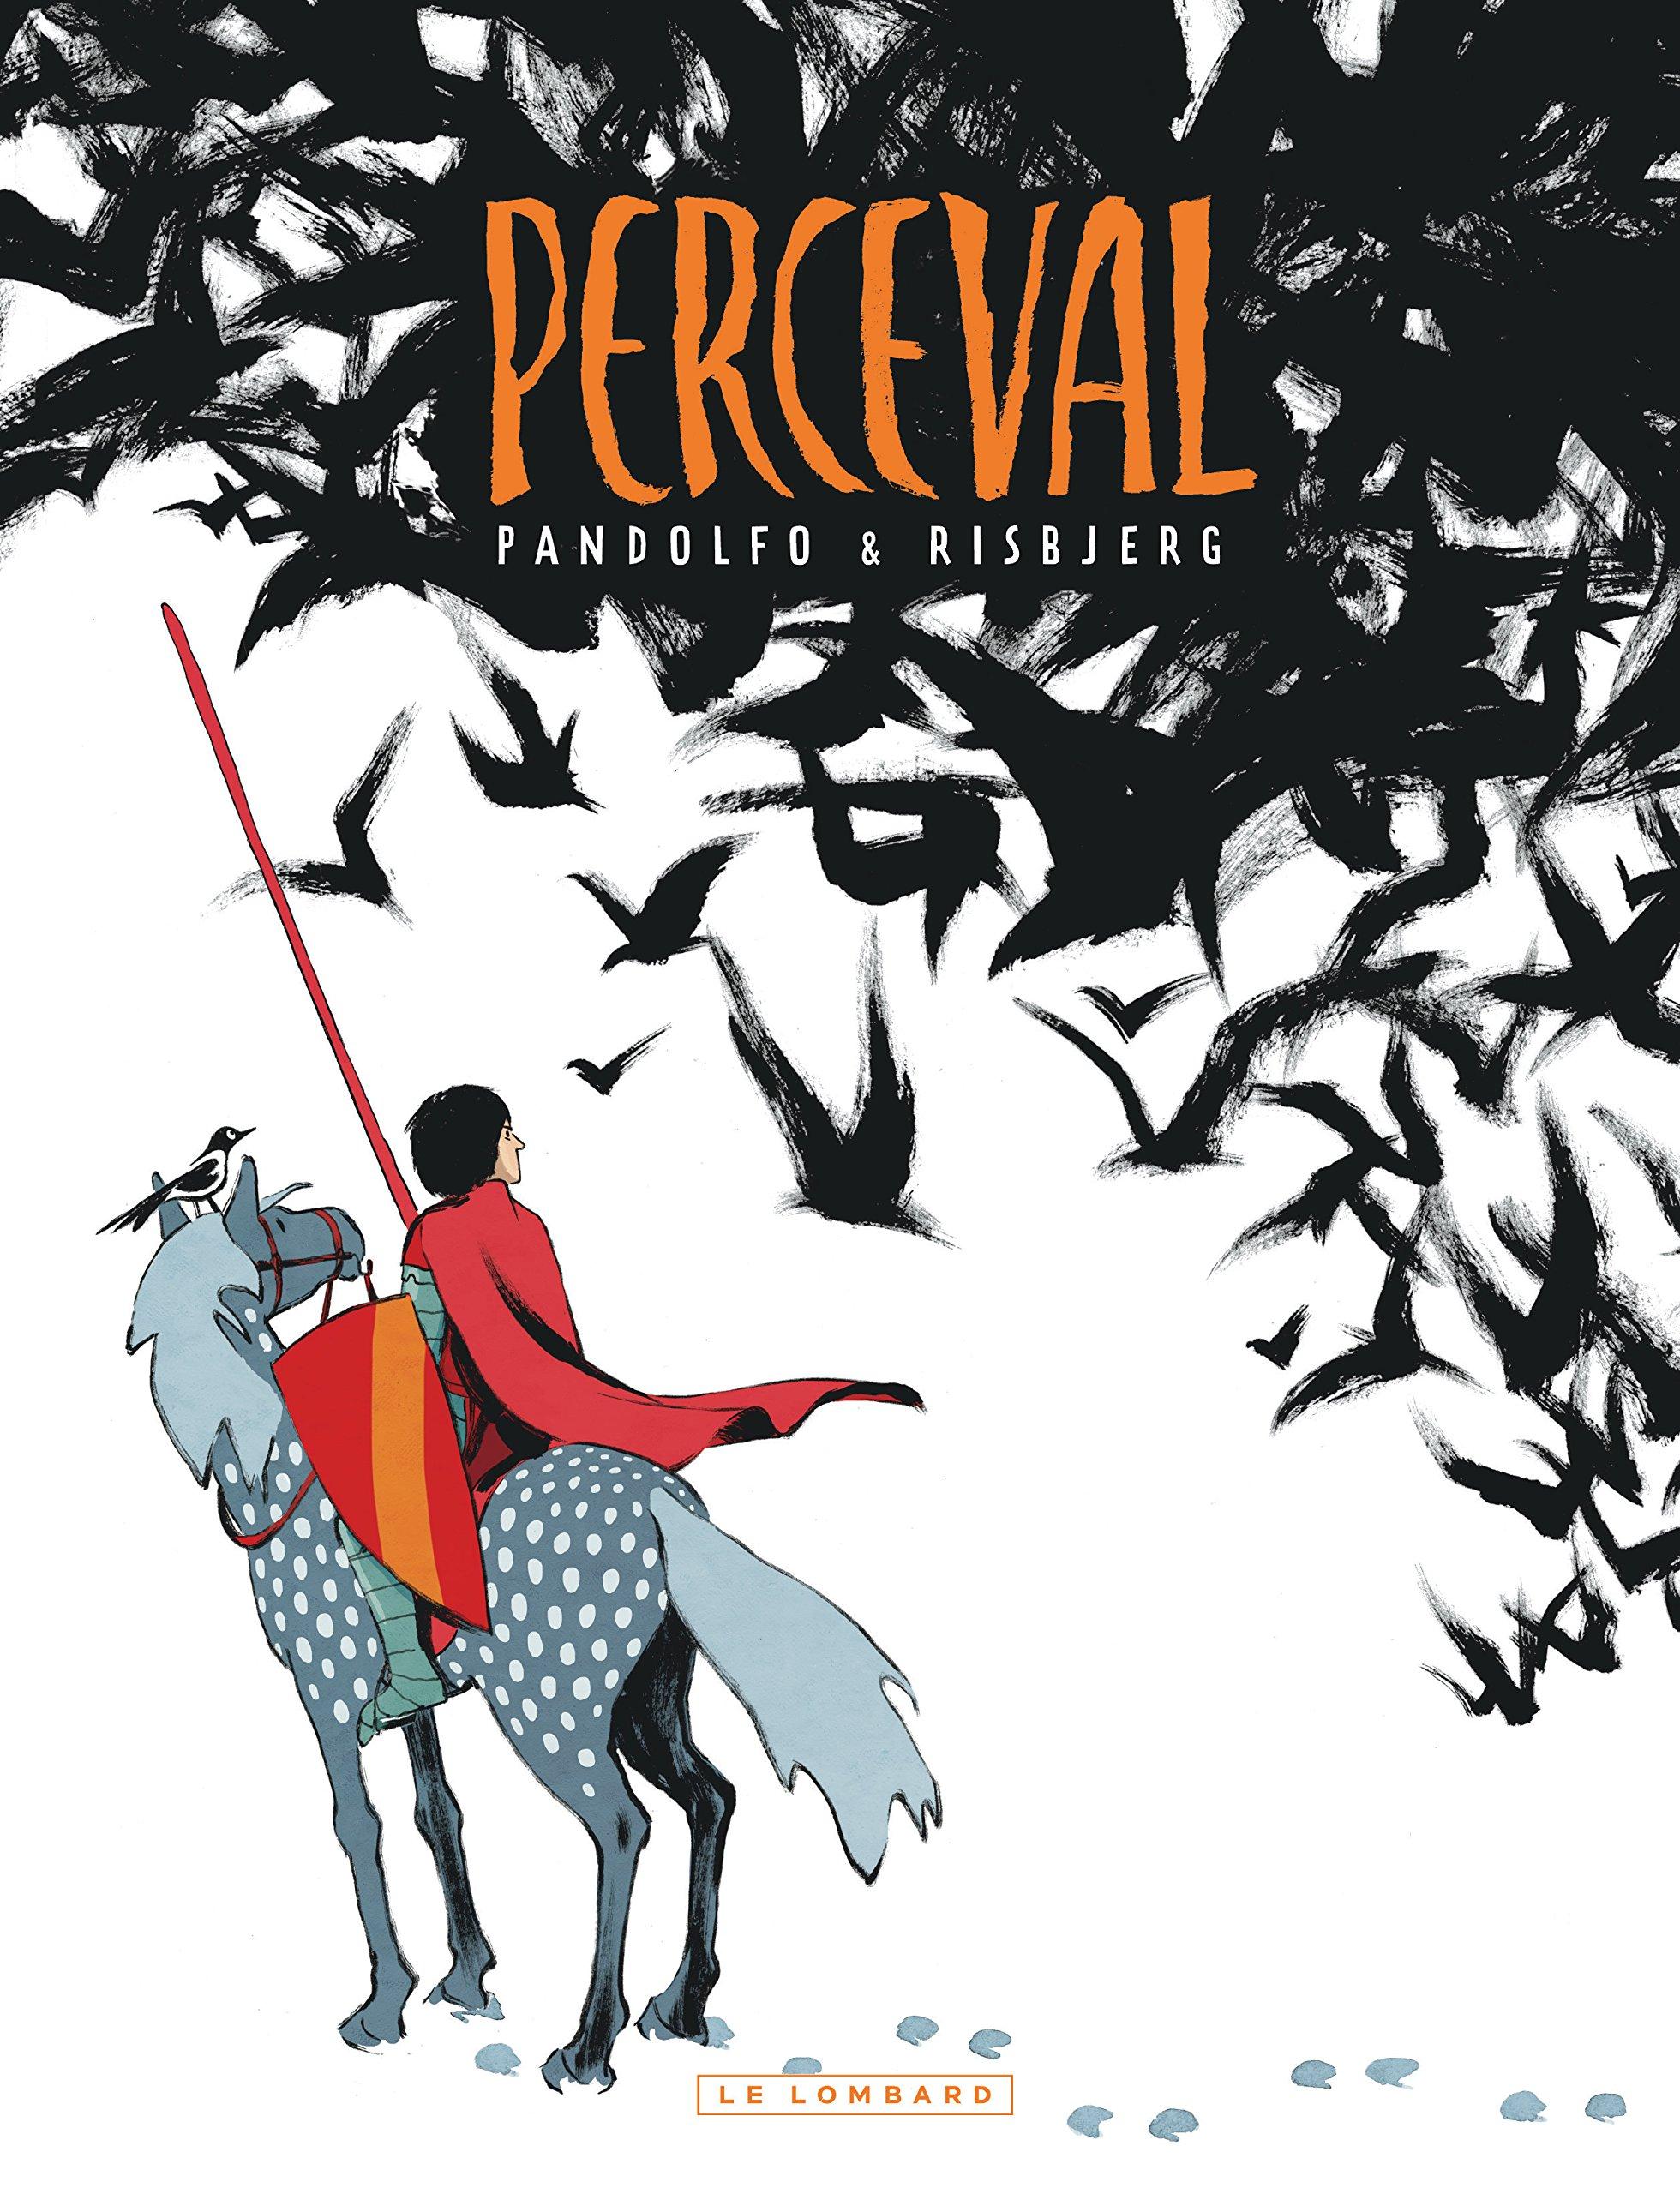 Perceval 1